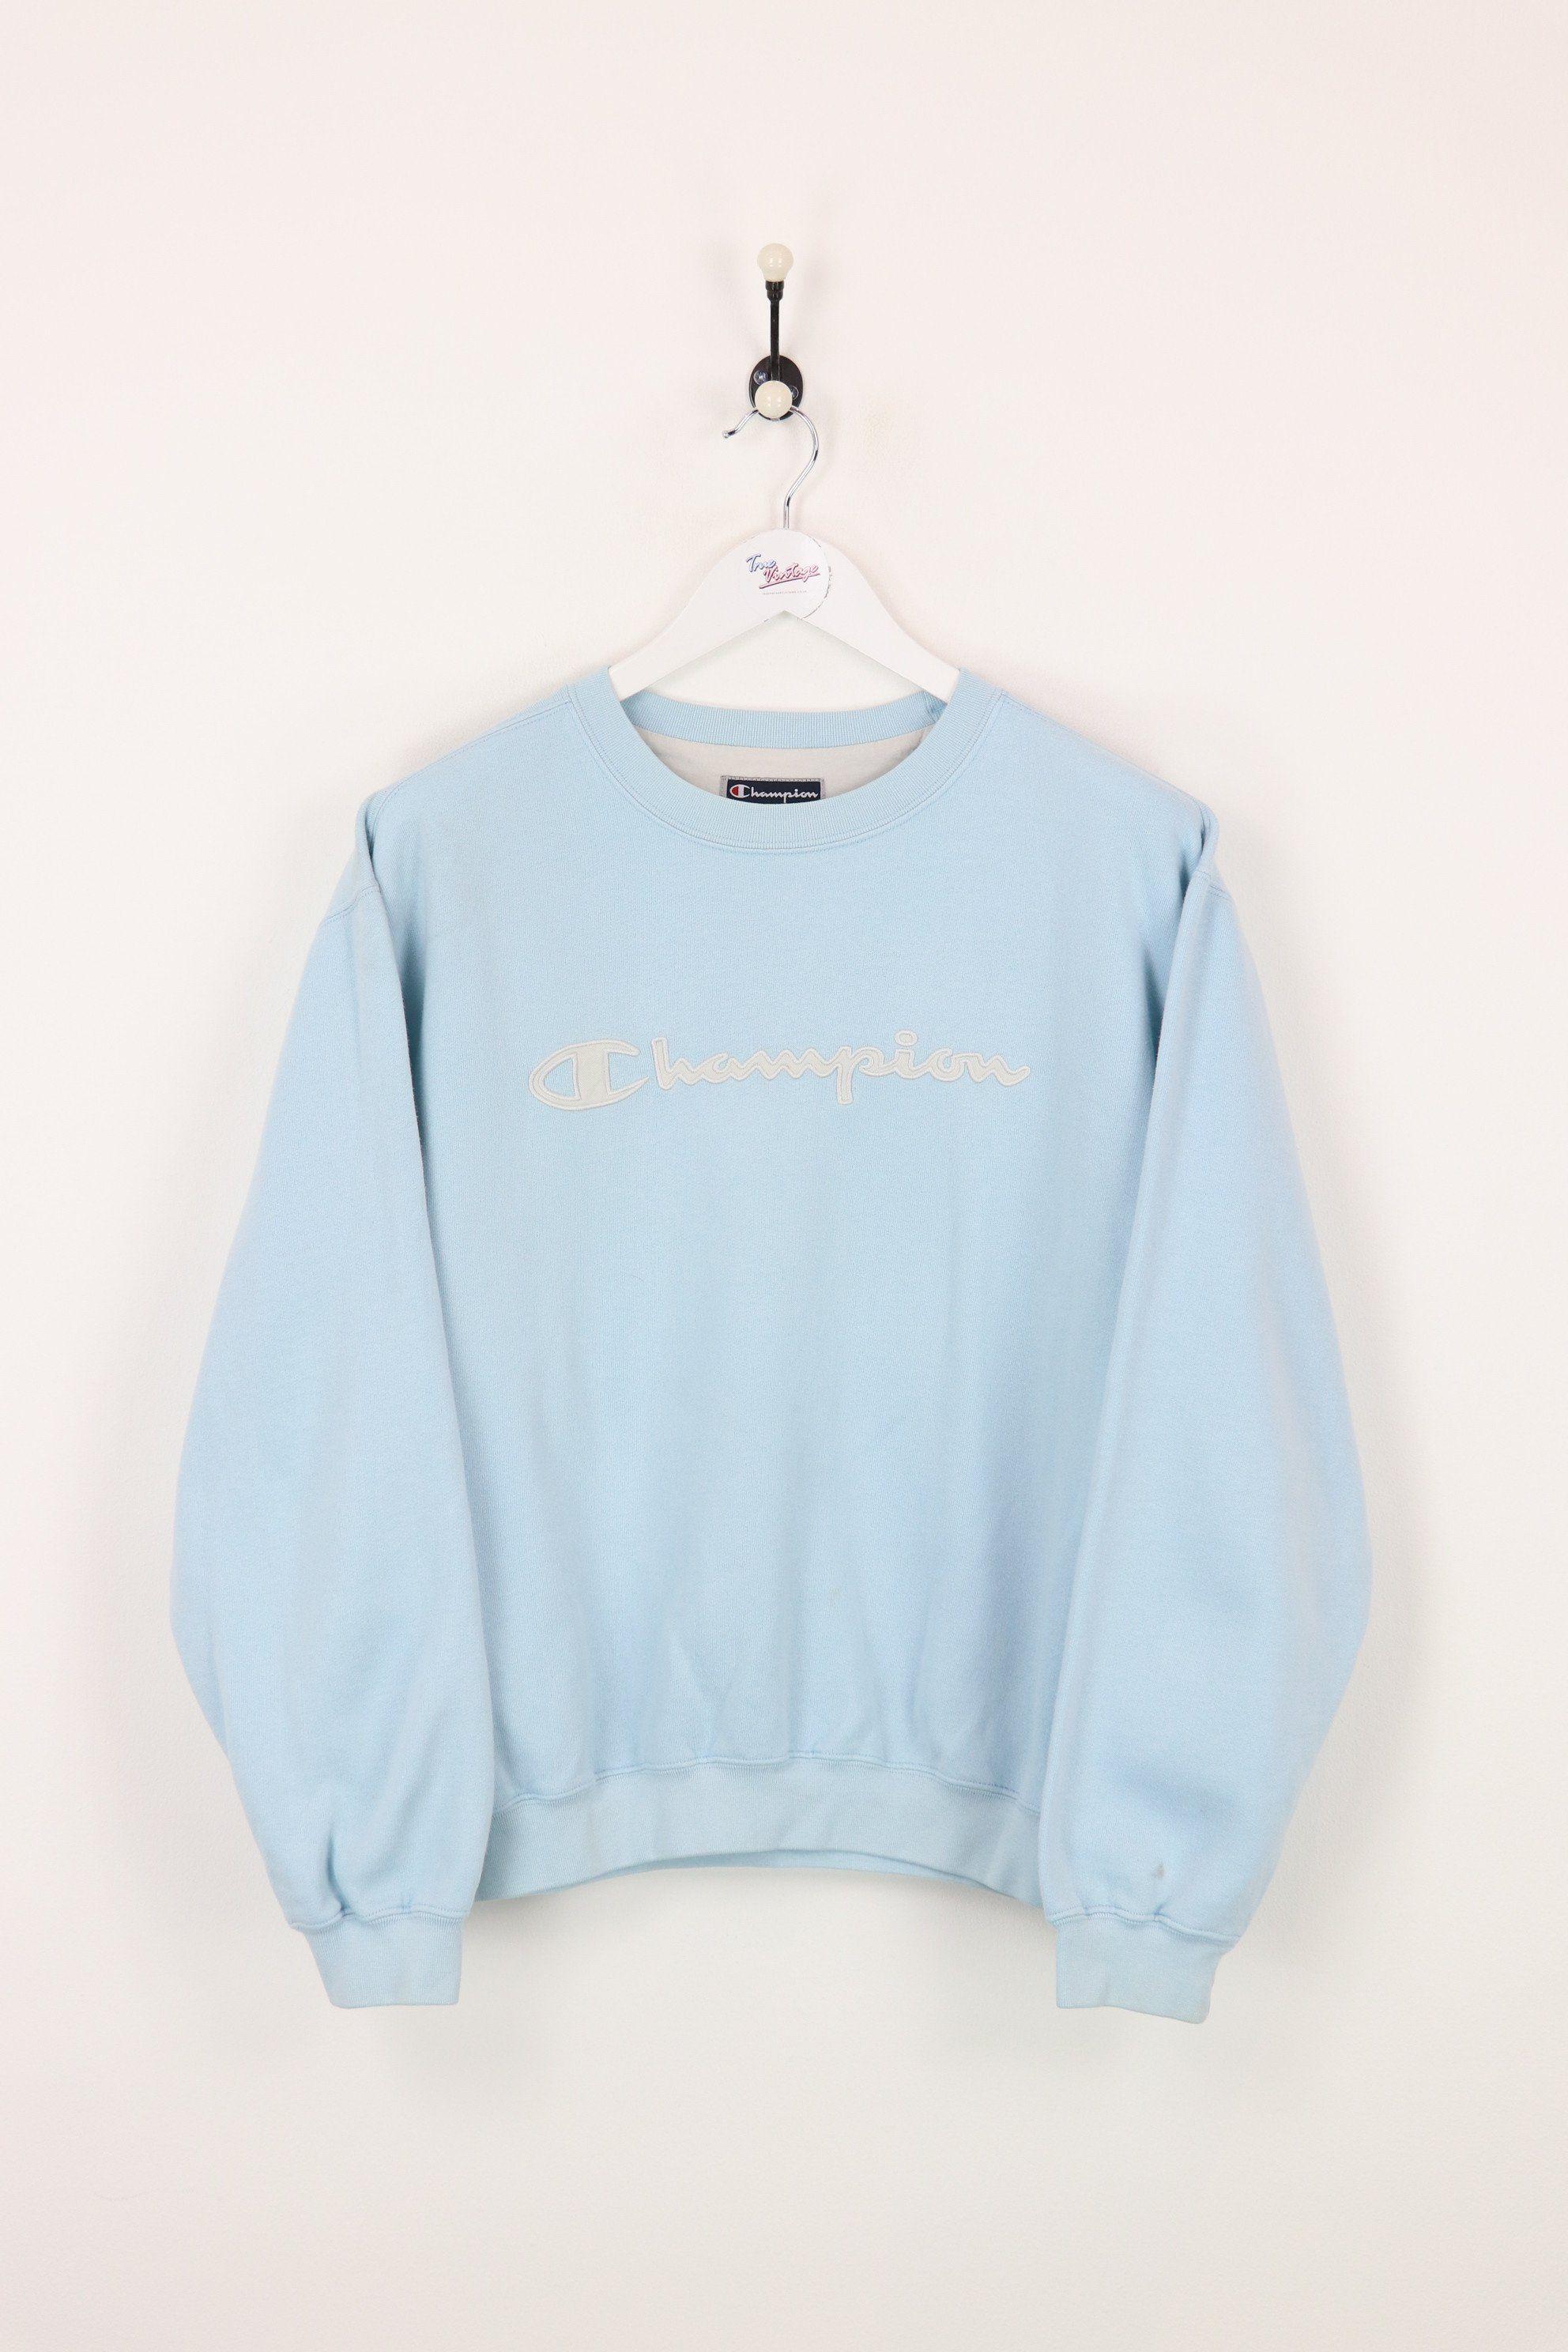 Champion Sweatshirt Baby Blue Medium Vendor Championtype Sweatshirts Hoodsprice 32 00 Very Good Sweatshirt Outfit Blue Champion Sweatshirt Sweatshirts [ 2976 x 1984 Pixel ]